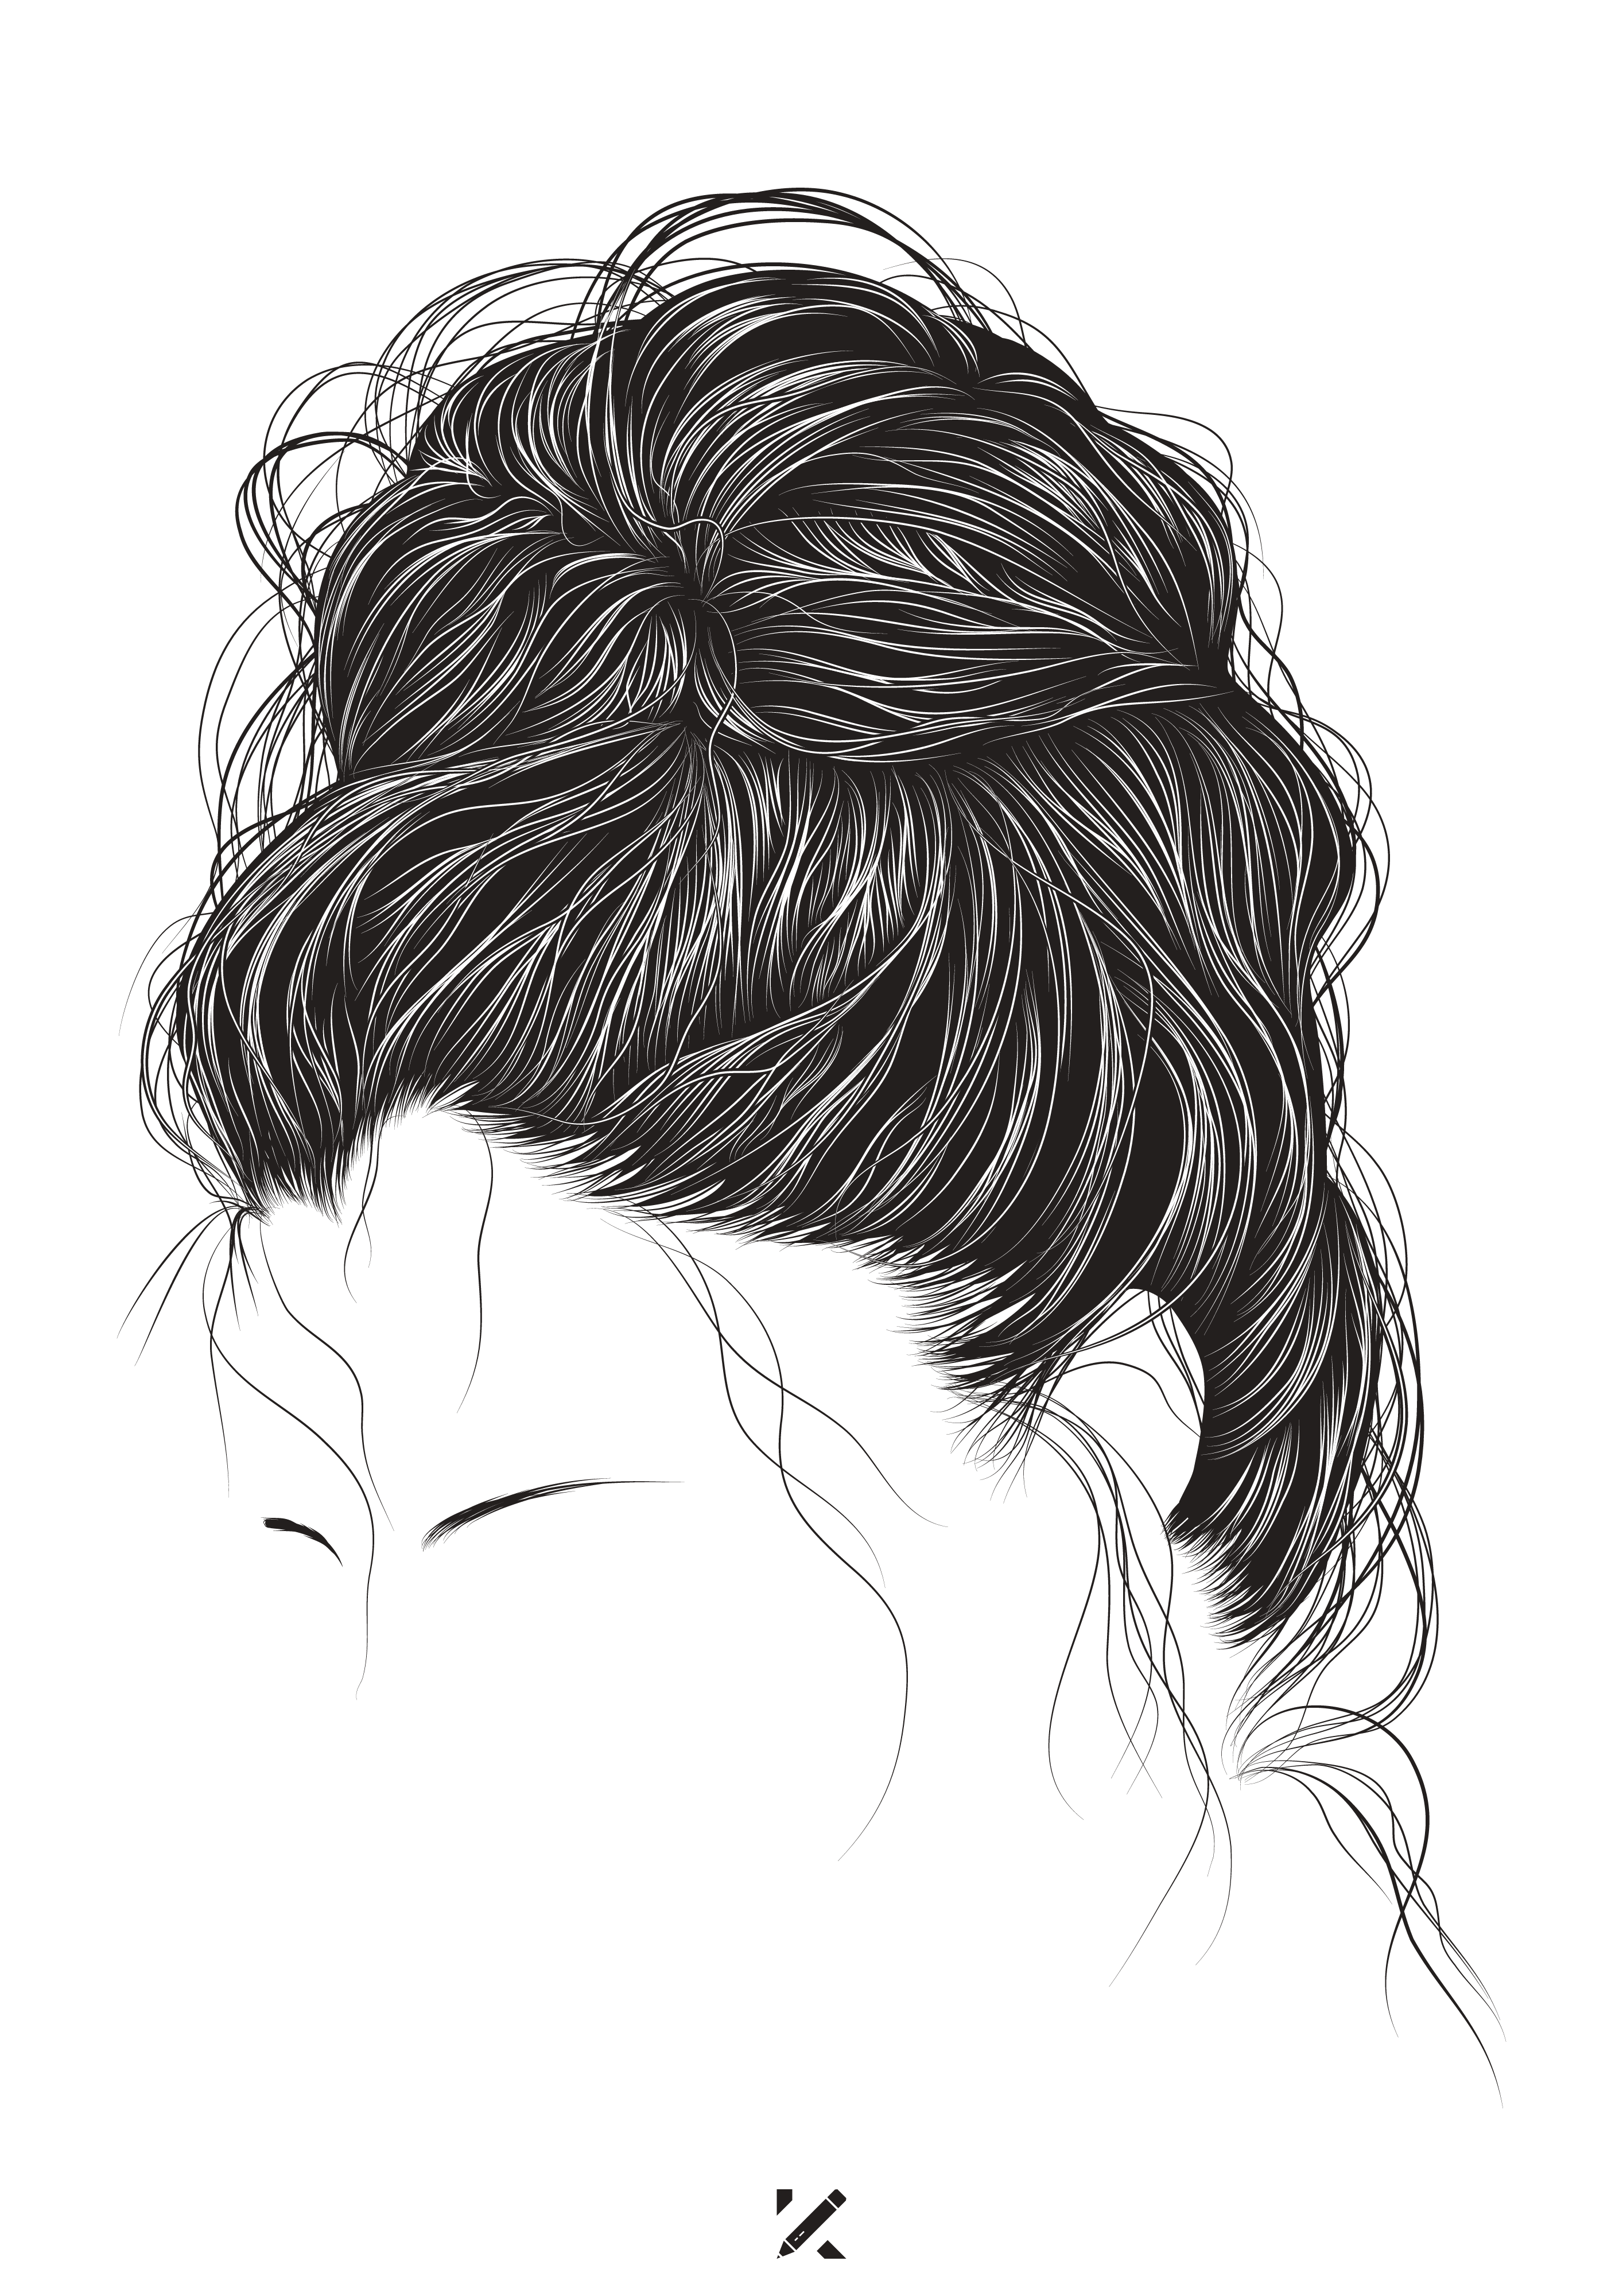 Messy Bun Outline : messy, outline, Urretabizkaia, Tattoo, Messy, Hairstyles,, Hairstyles